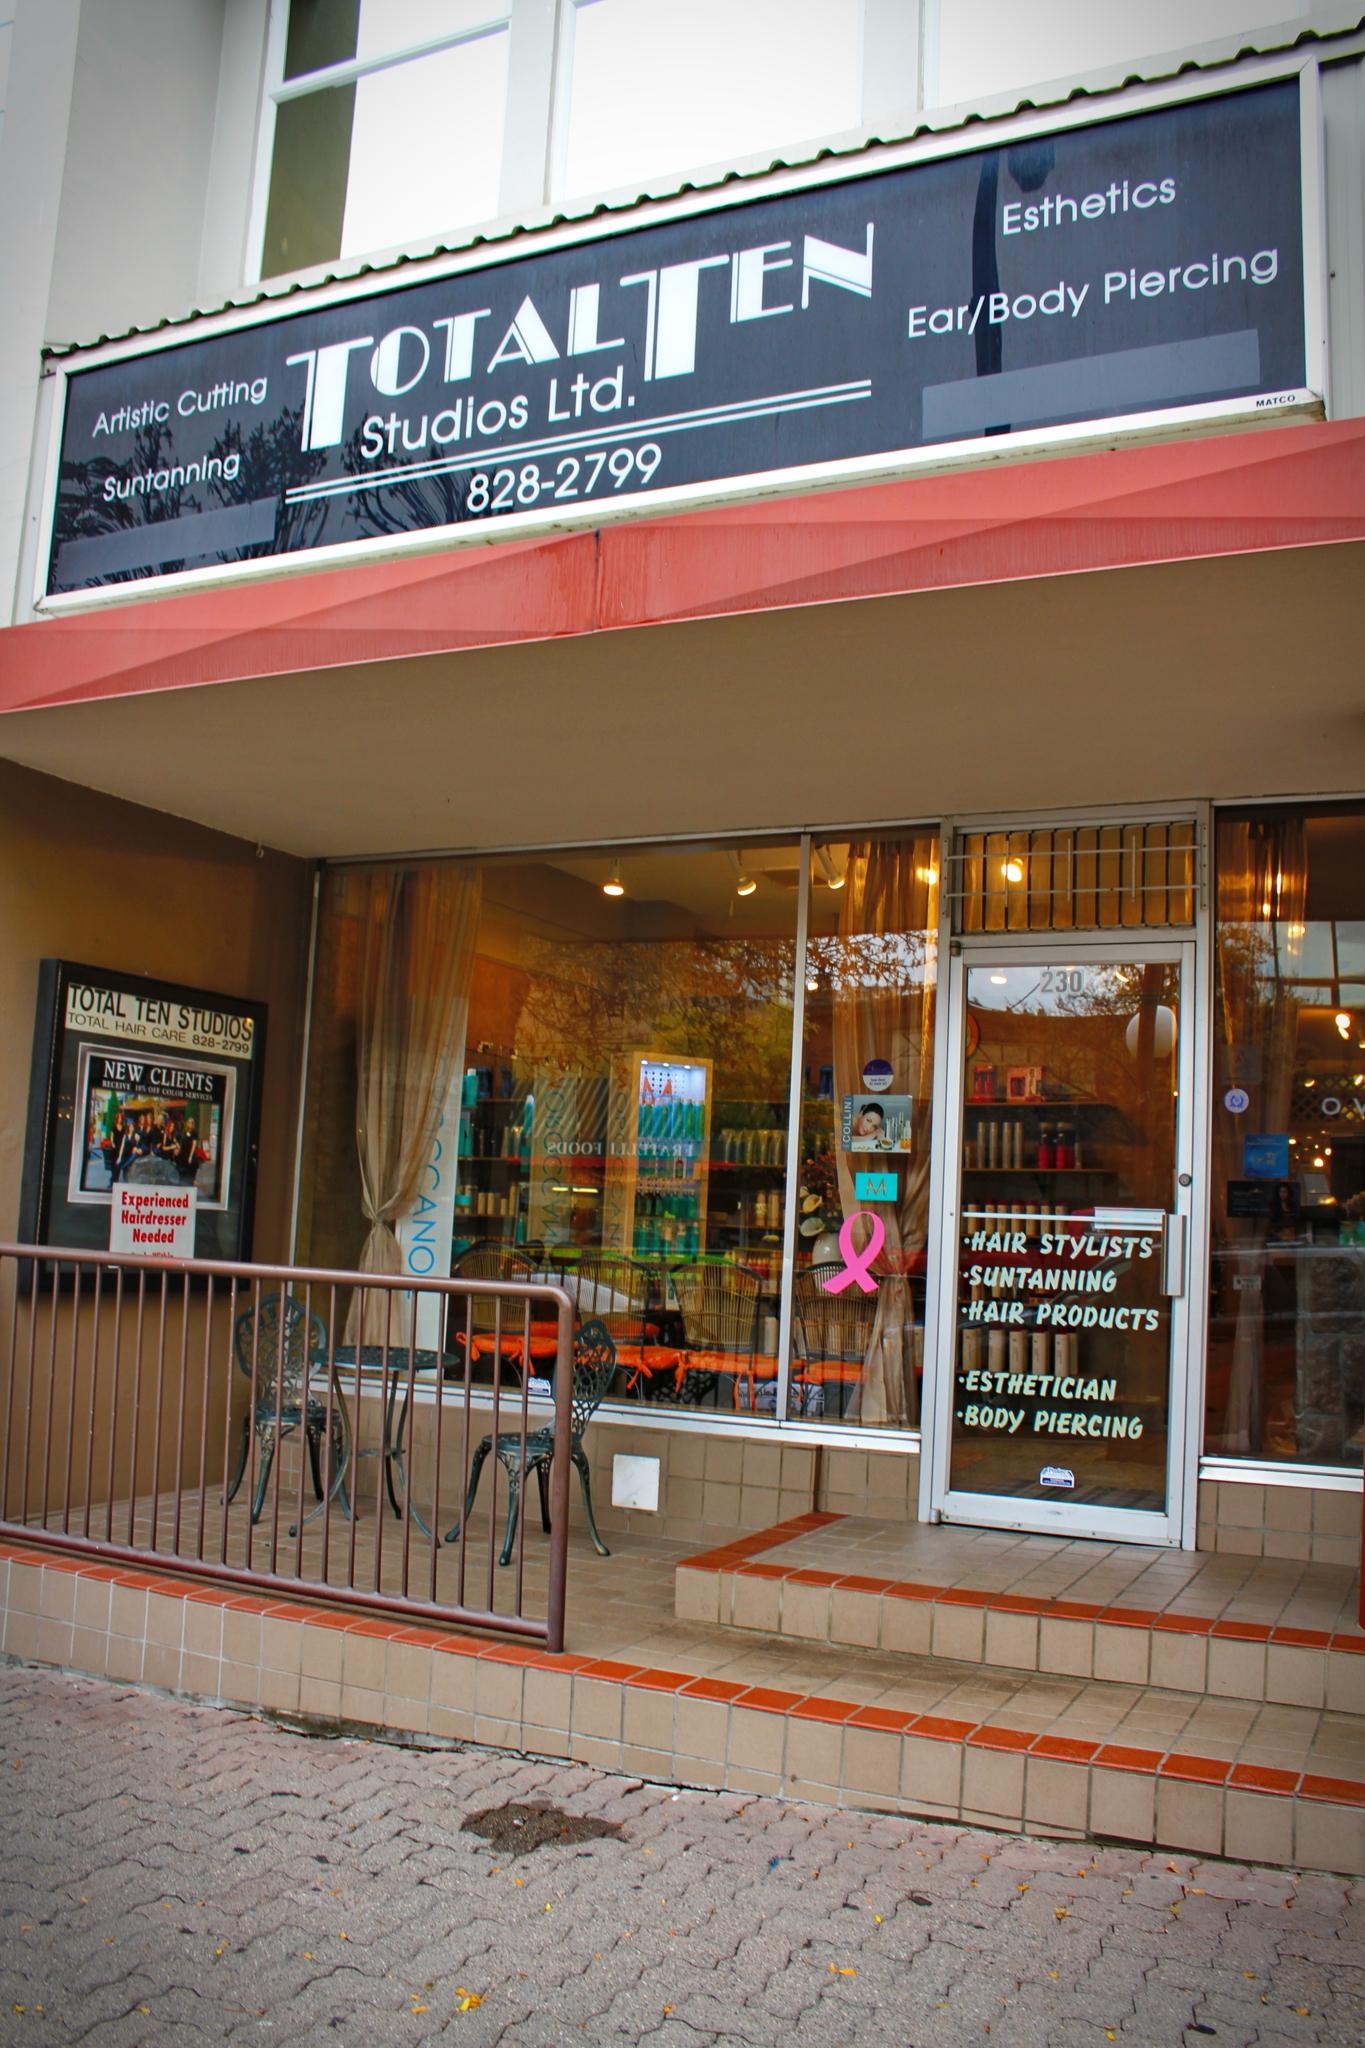 Total Ten Studios Ltd à Kamloops